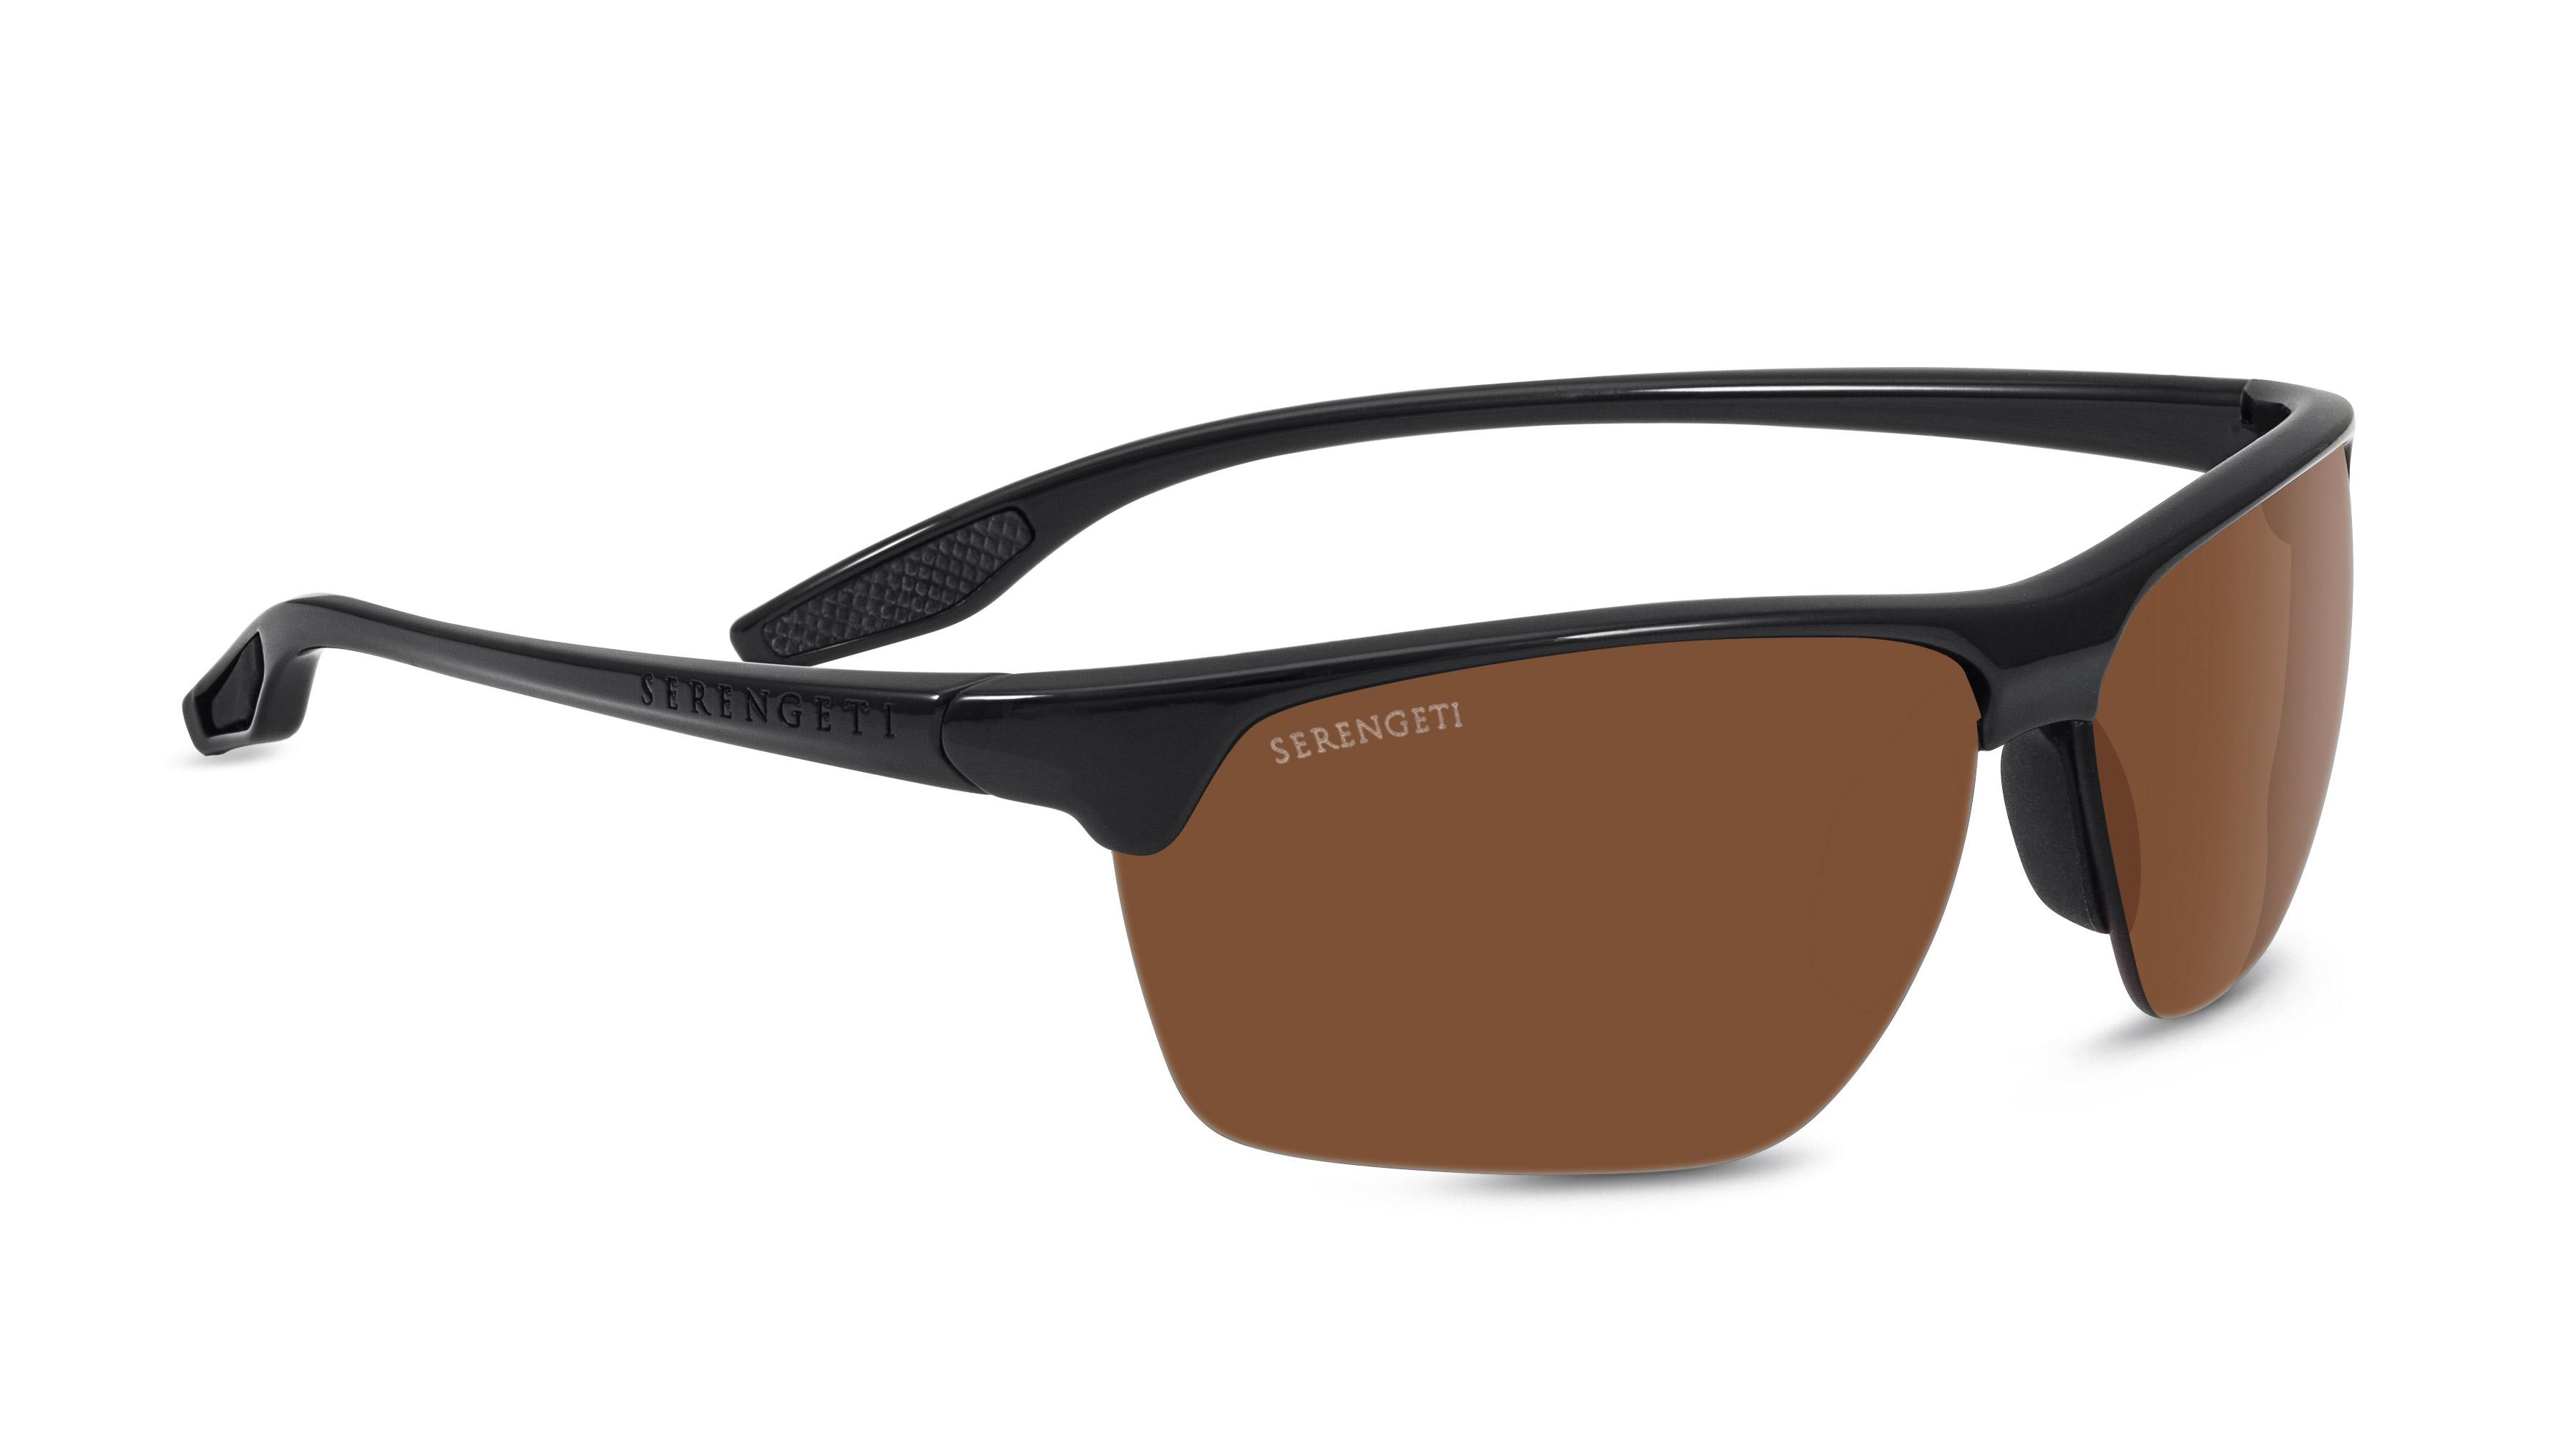 ee39c8dba2 Serengeti Linosa Sunglasses FREE S H 8505